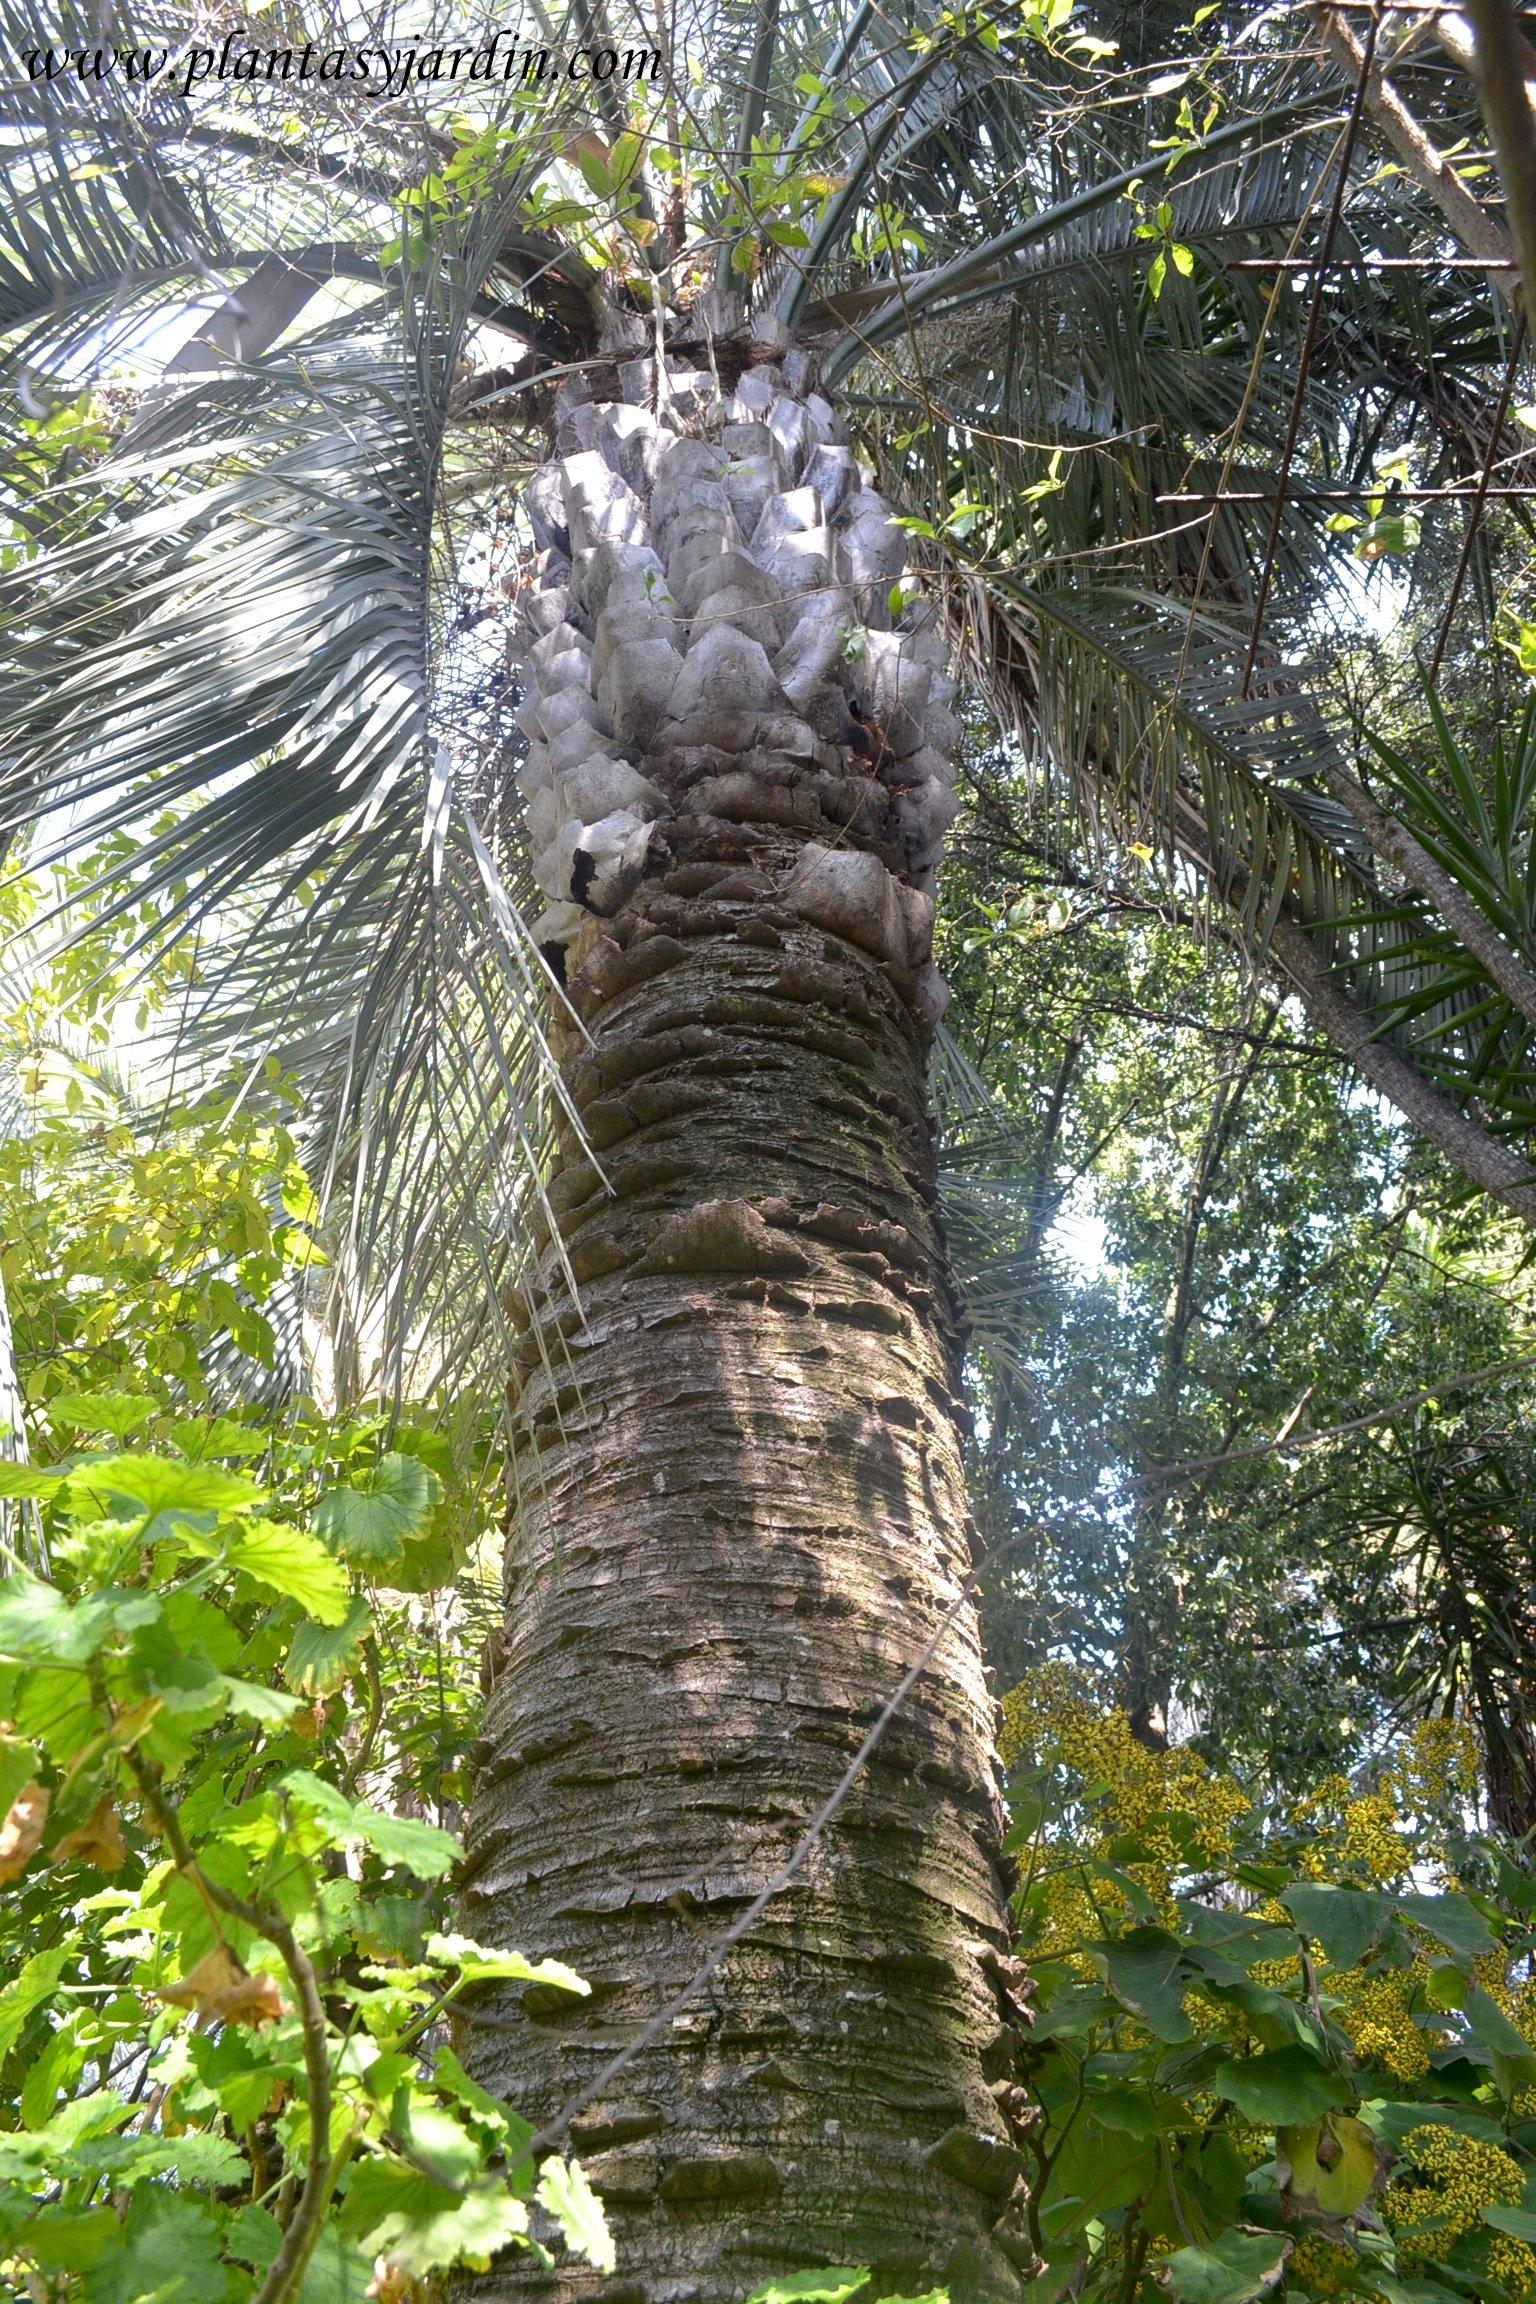 Butia capitata nativa del noreste de Argentina